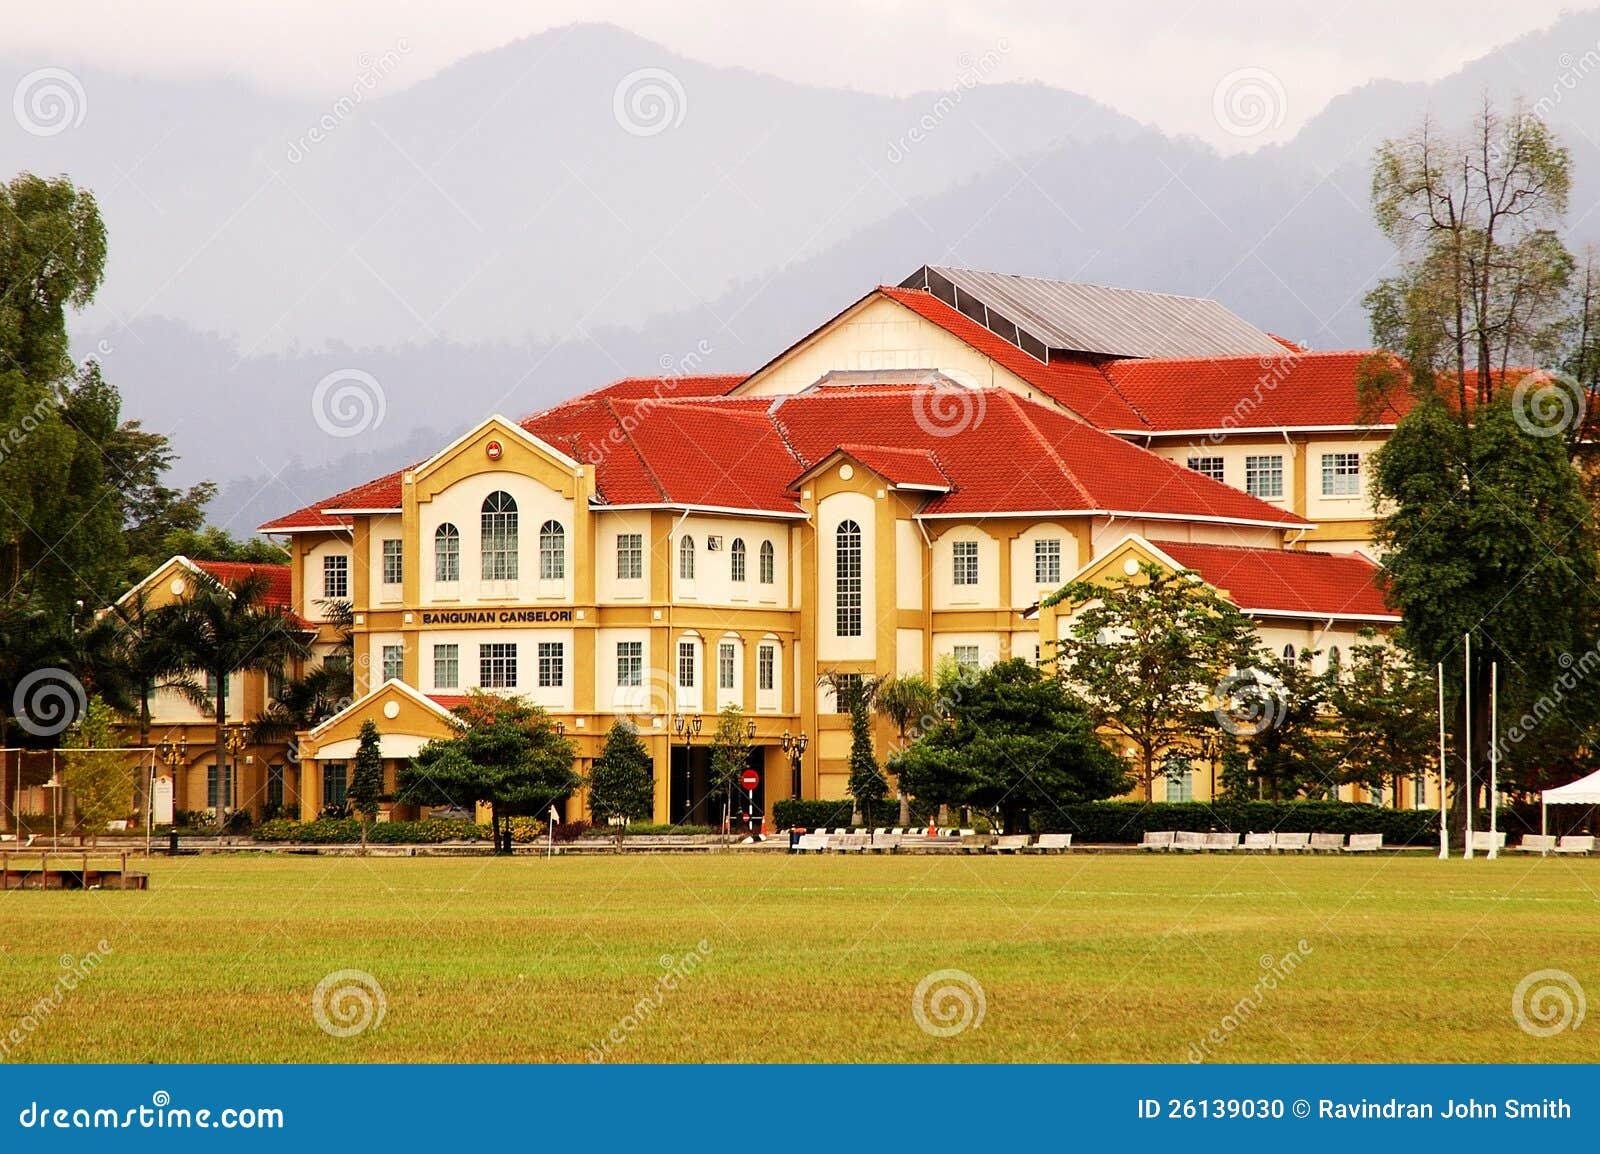 University Perguruan Sultan Idris Editorial Image Image Of College University 26139030